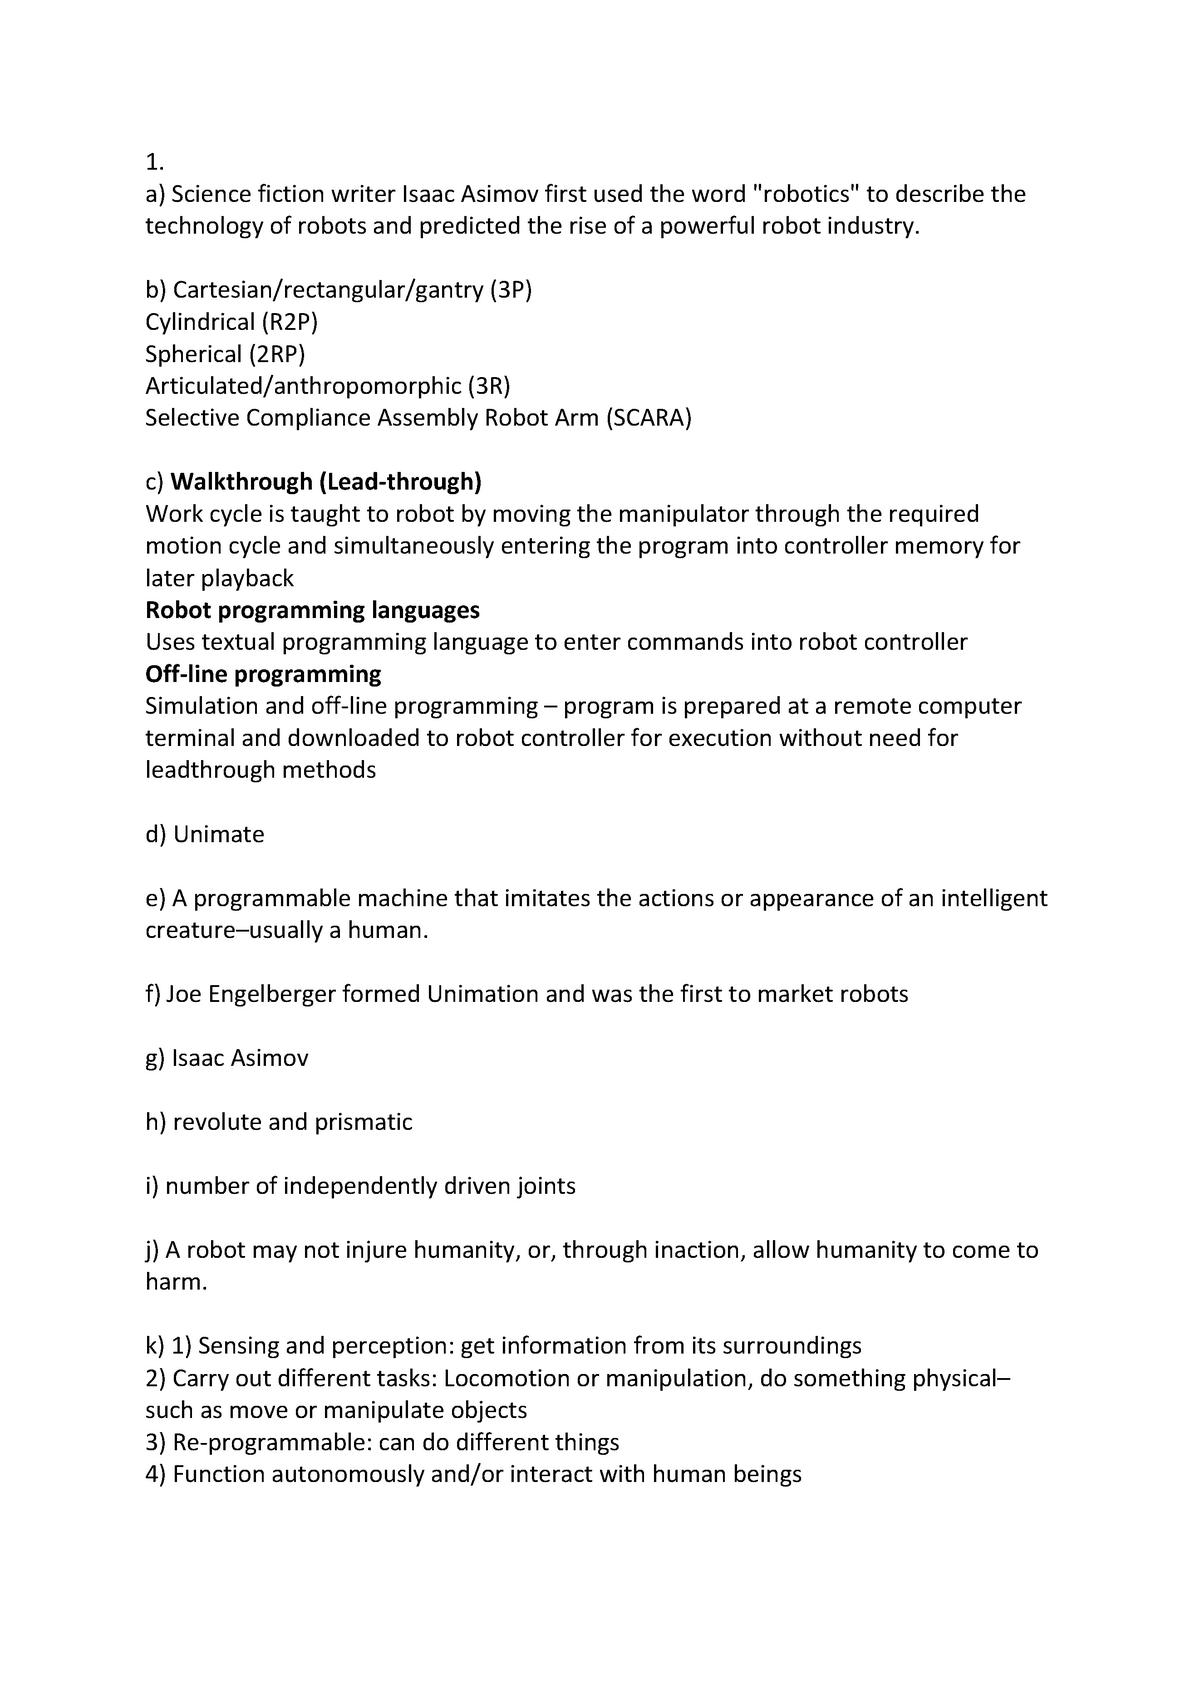 Revision Question answer - EGA366 - Swansea - StuDocu